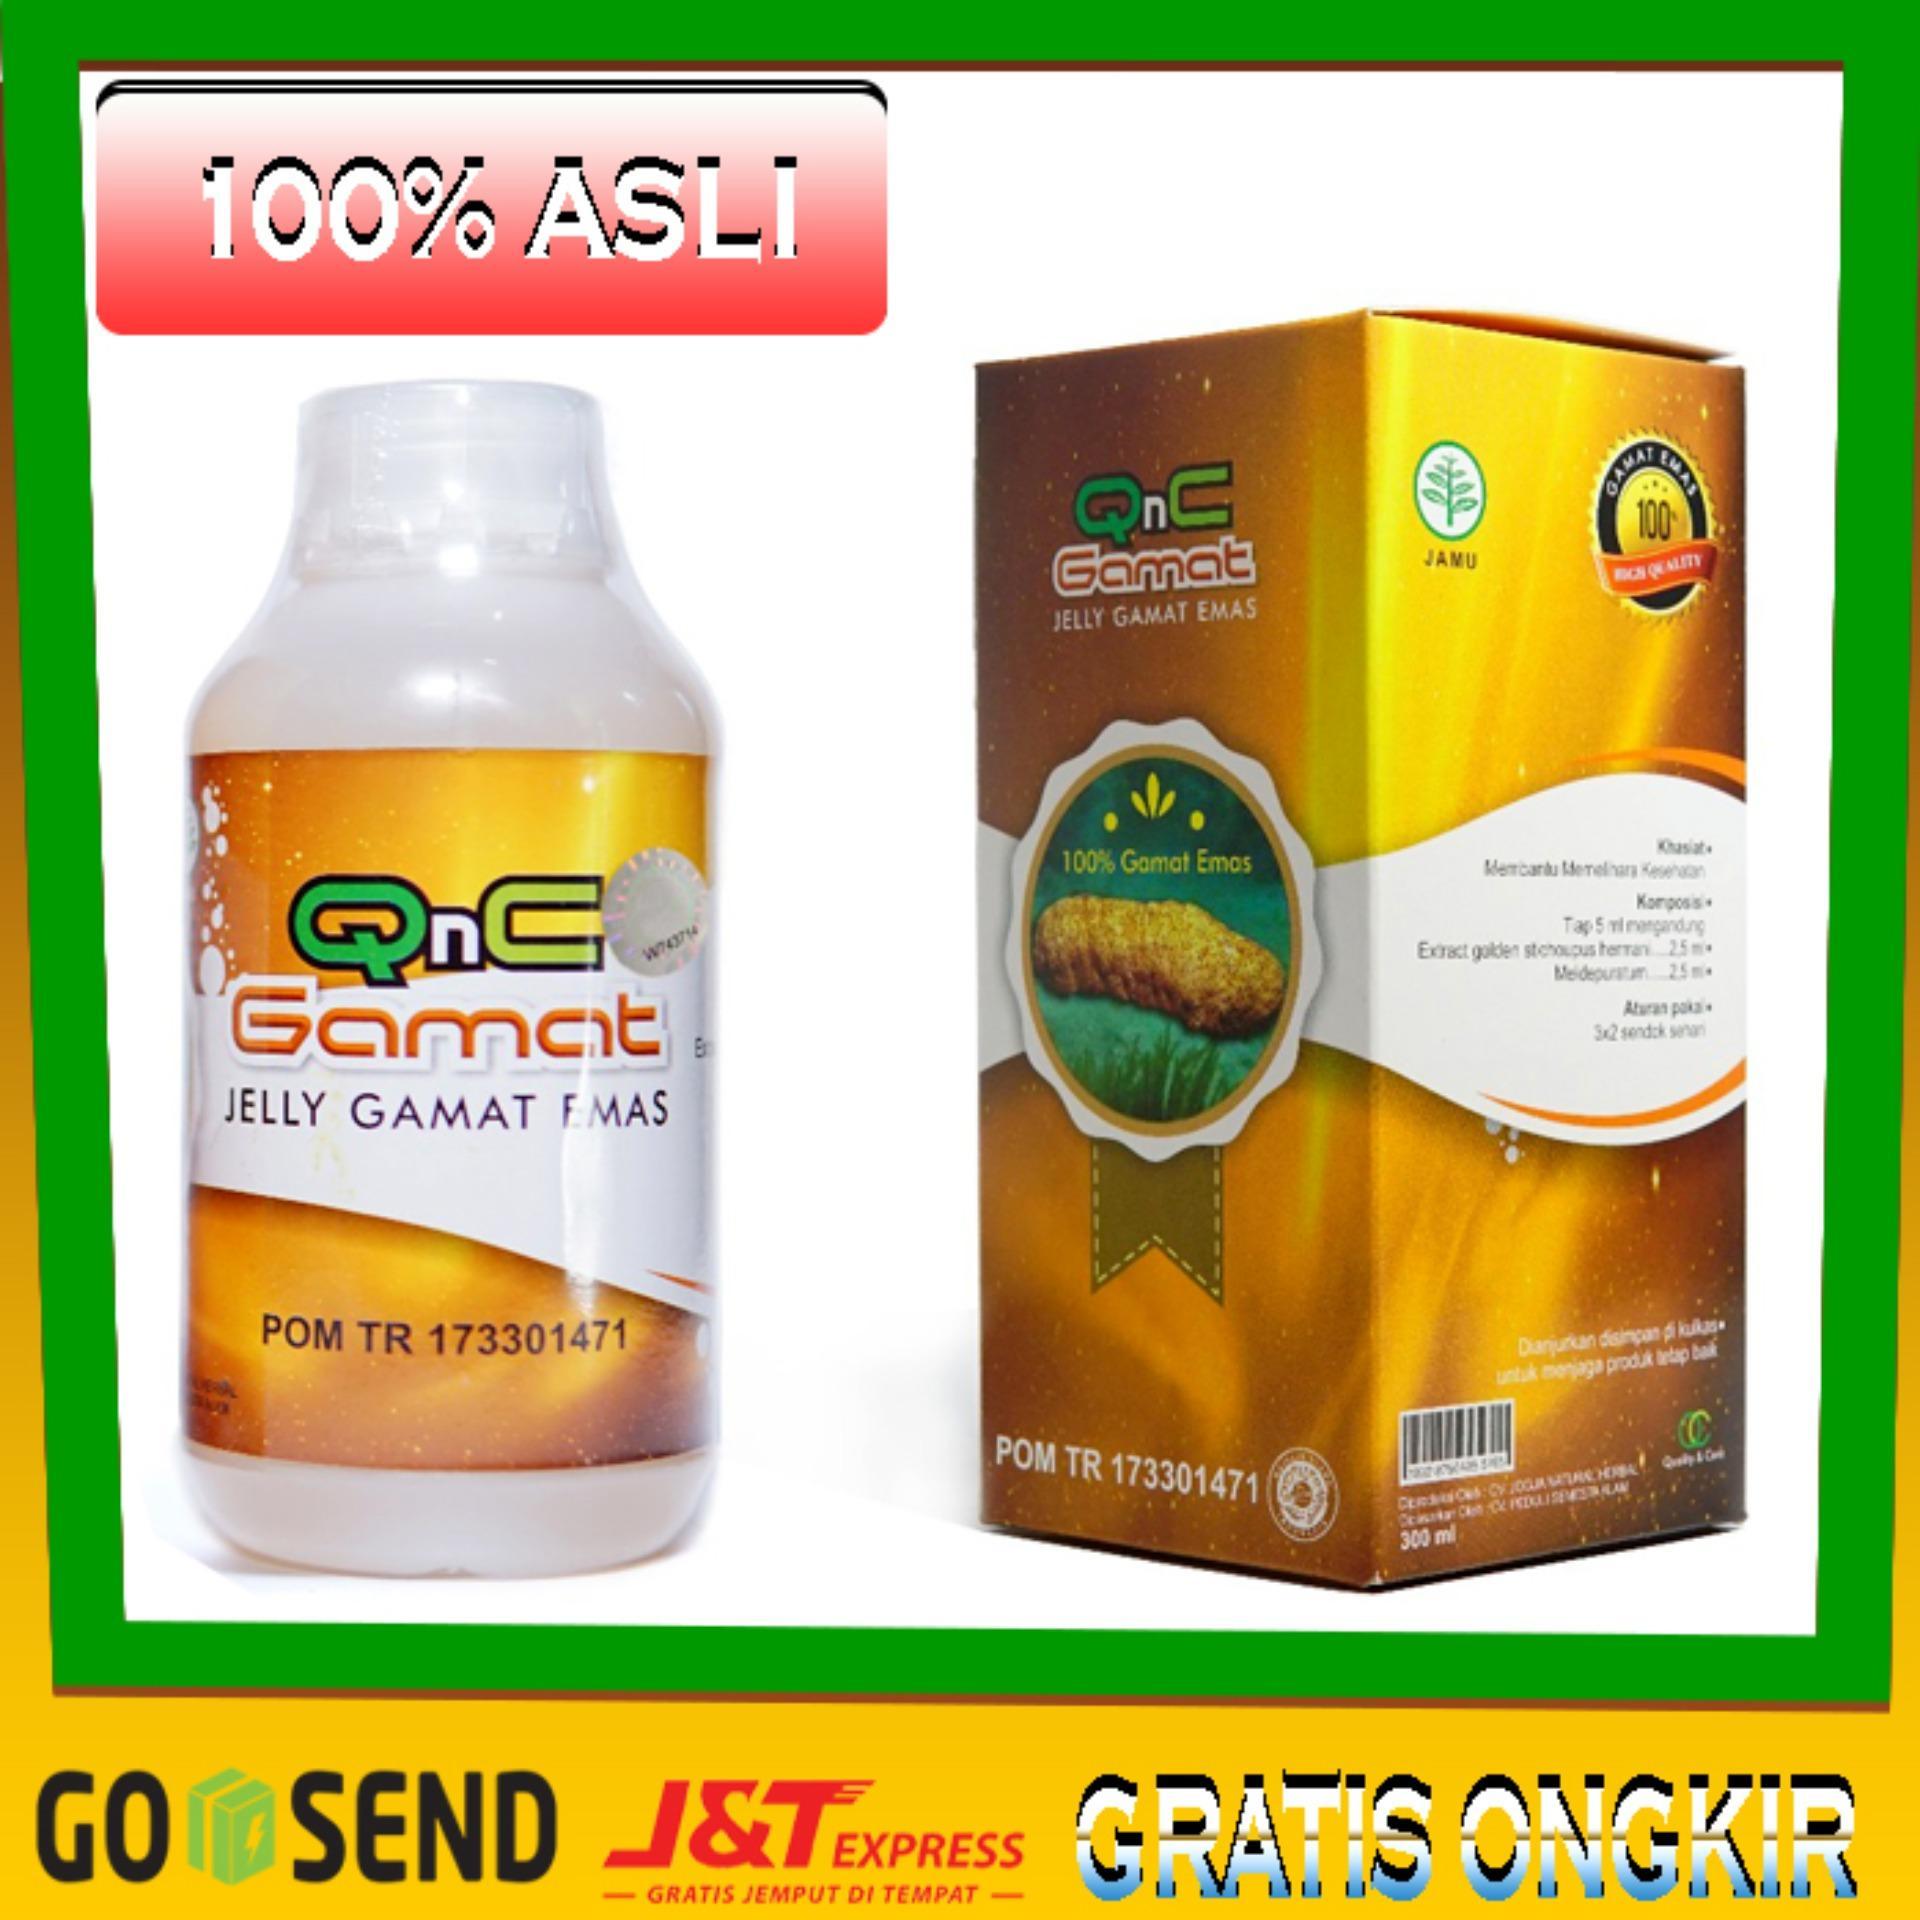 Buy Sell Cheapest Obat Bopeng Best Quality Product Deals Qnc Jelly Gamat Jeli Emas Original Ampuh Jerawat Bekas Asli